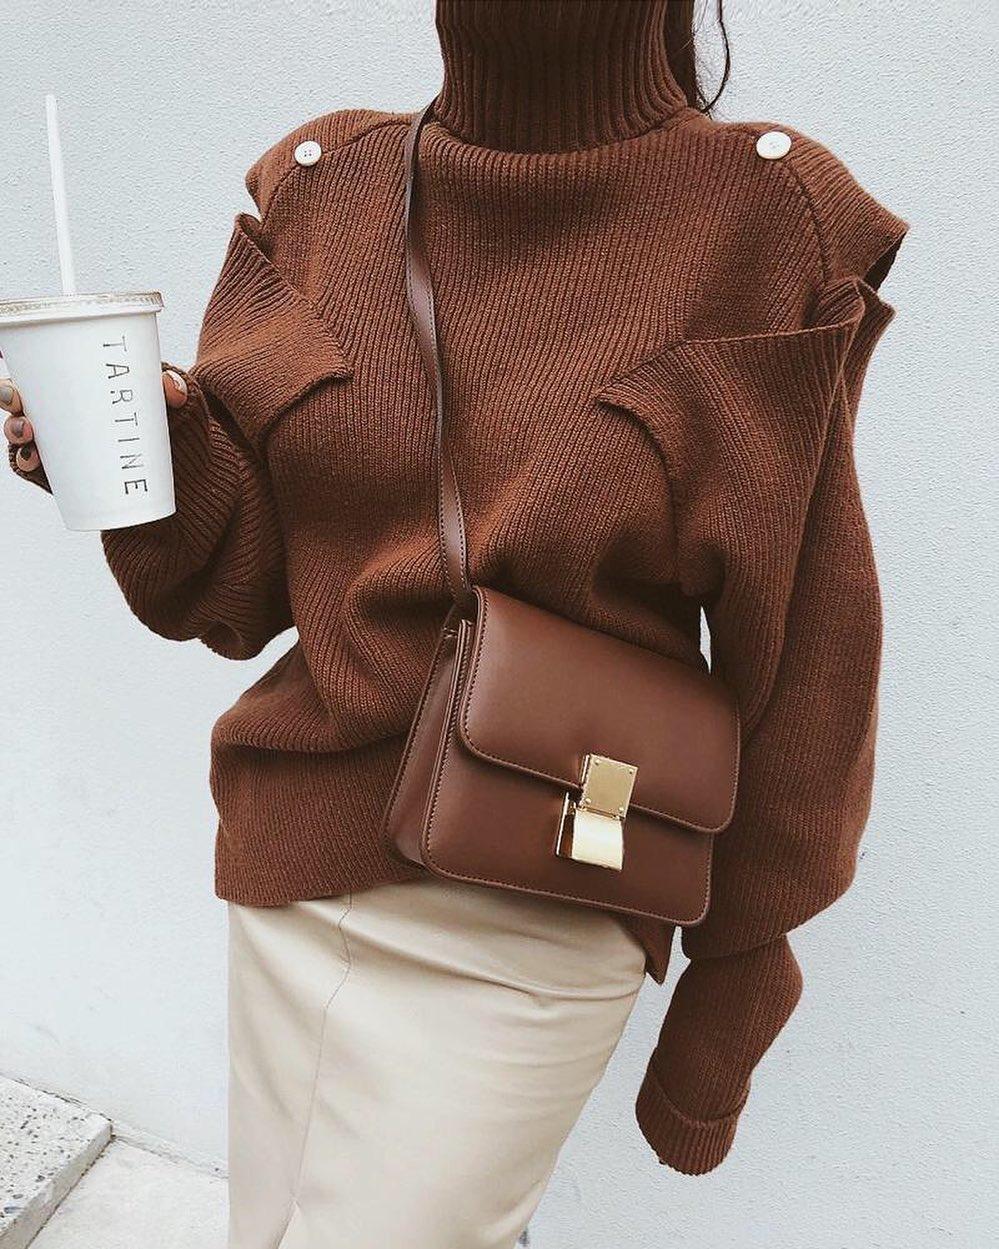 jersey marrón mujer